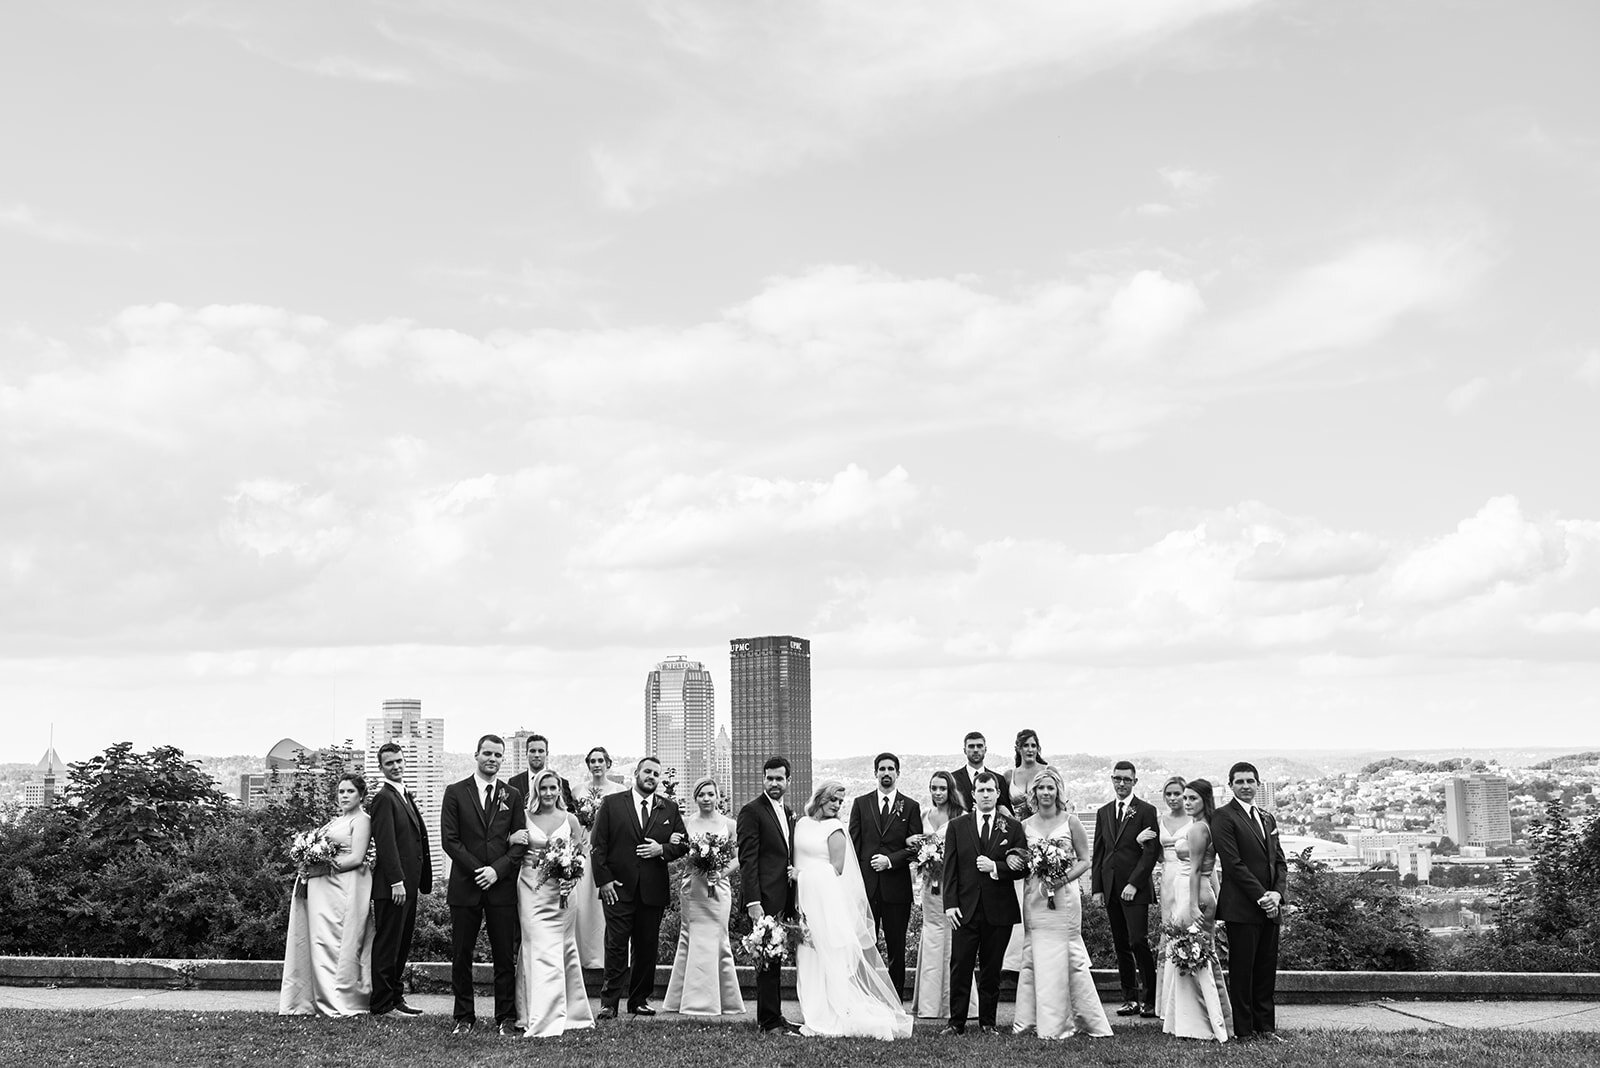 Erika_and_Kevin_Wedding-326.jpg